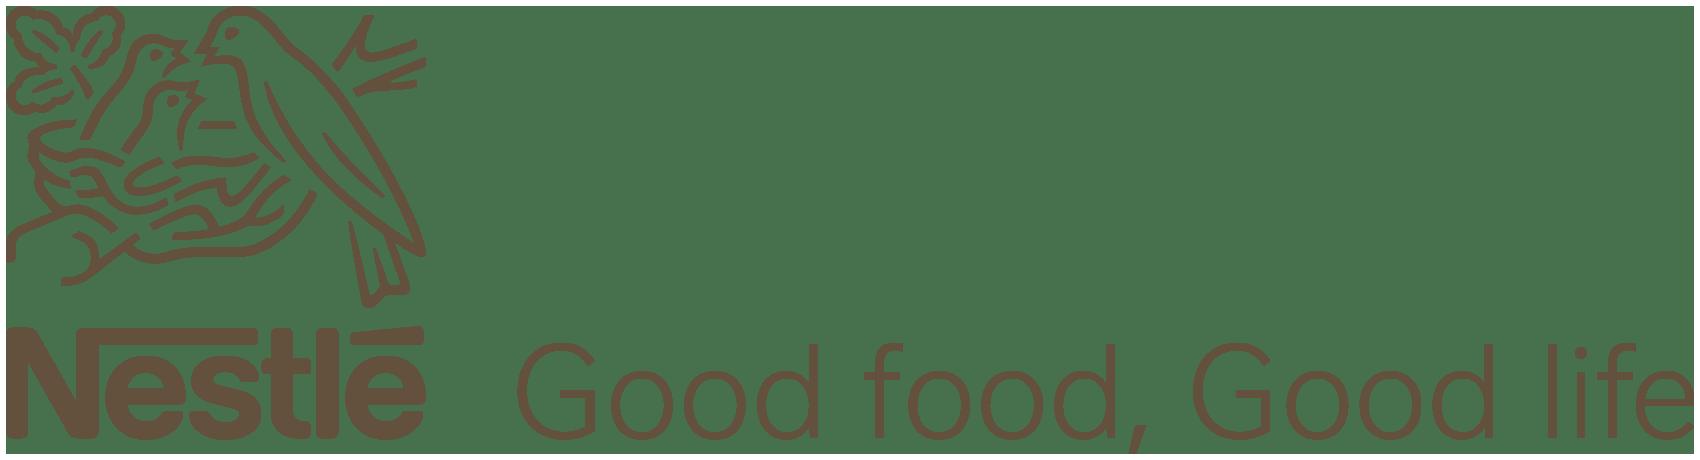 upost logo